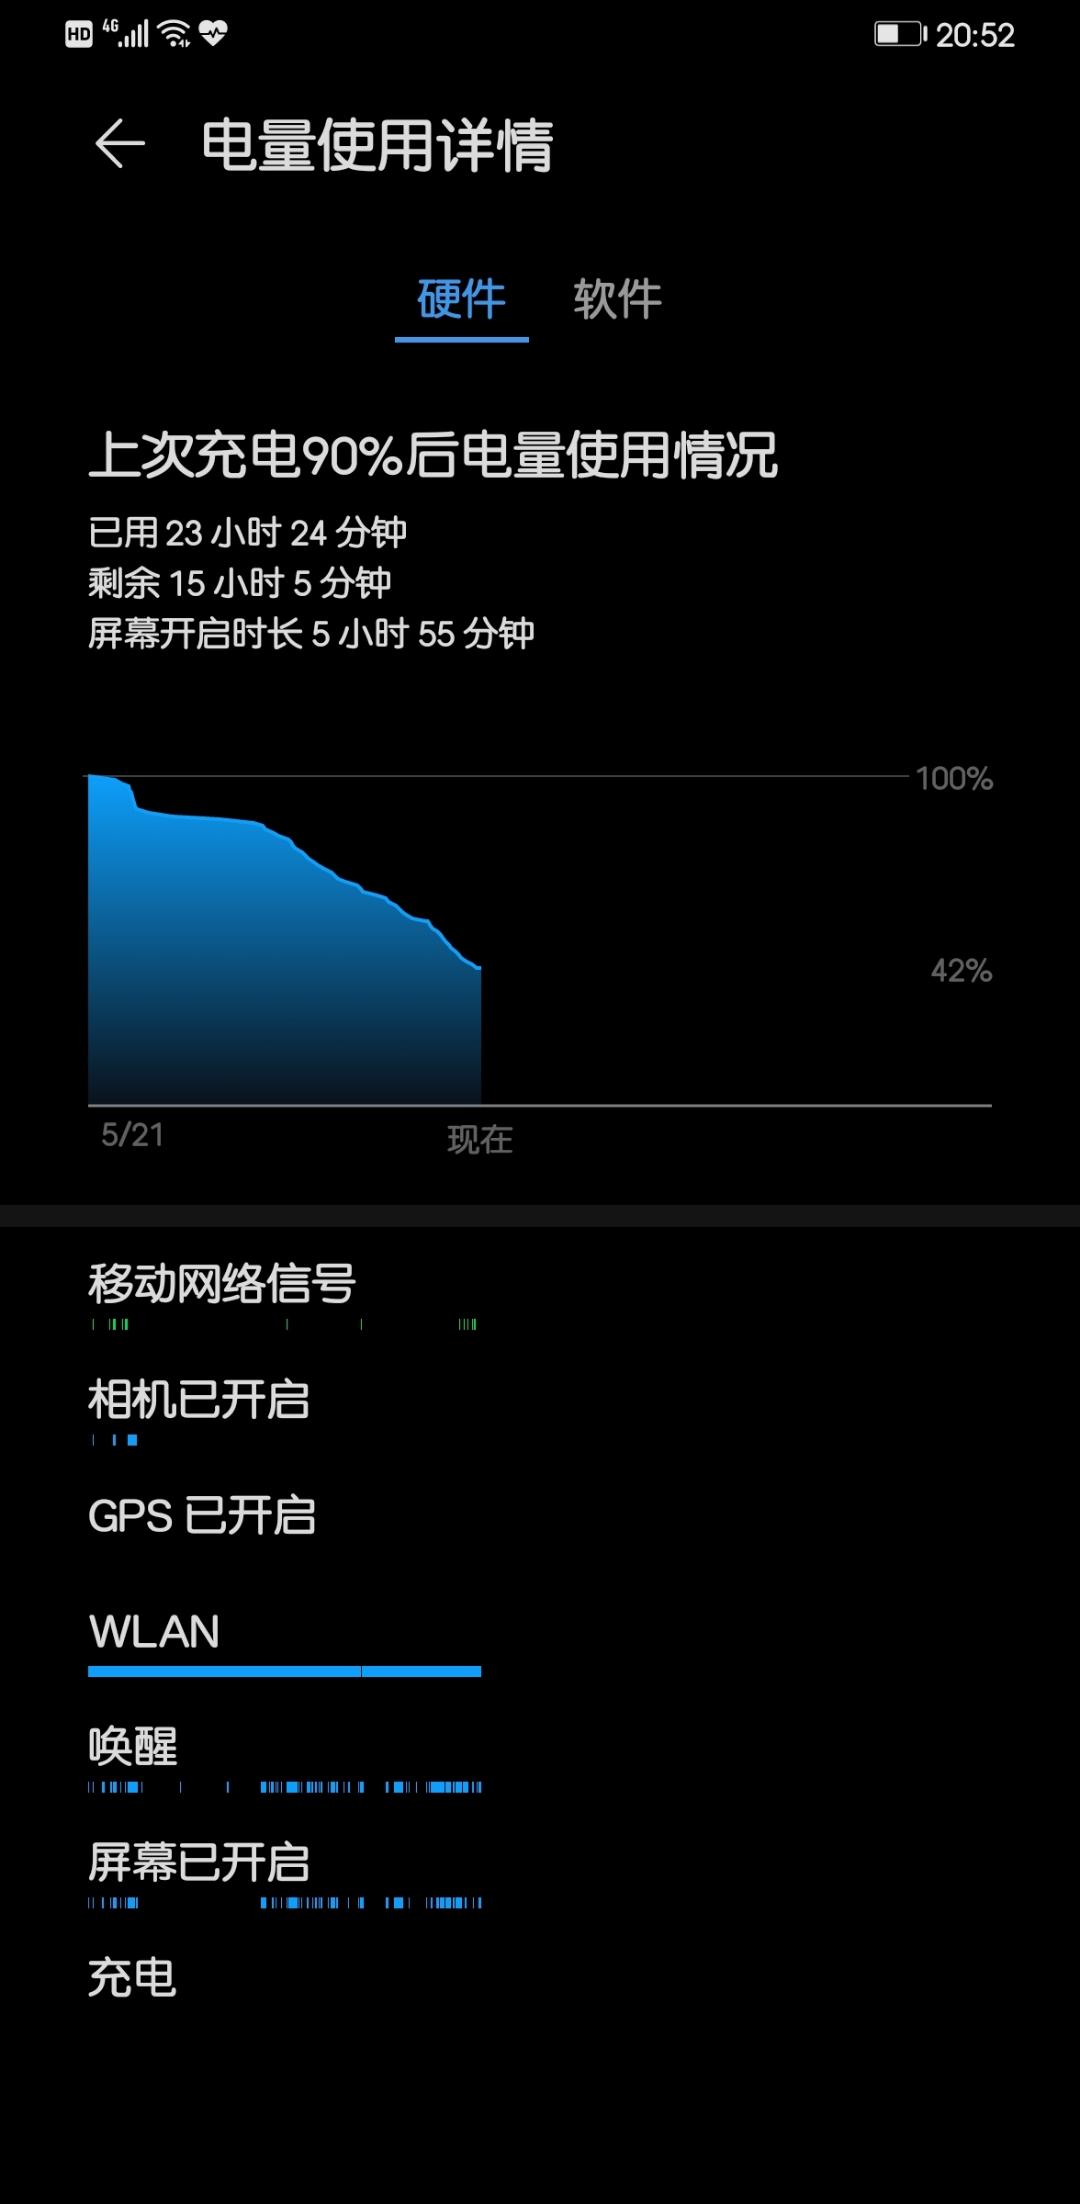 Screenshot_20200521_205200_com.huawei.systemmanager.jpg